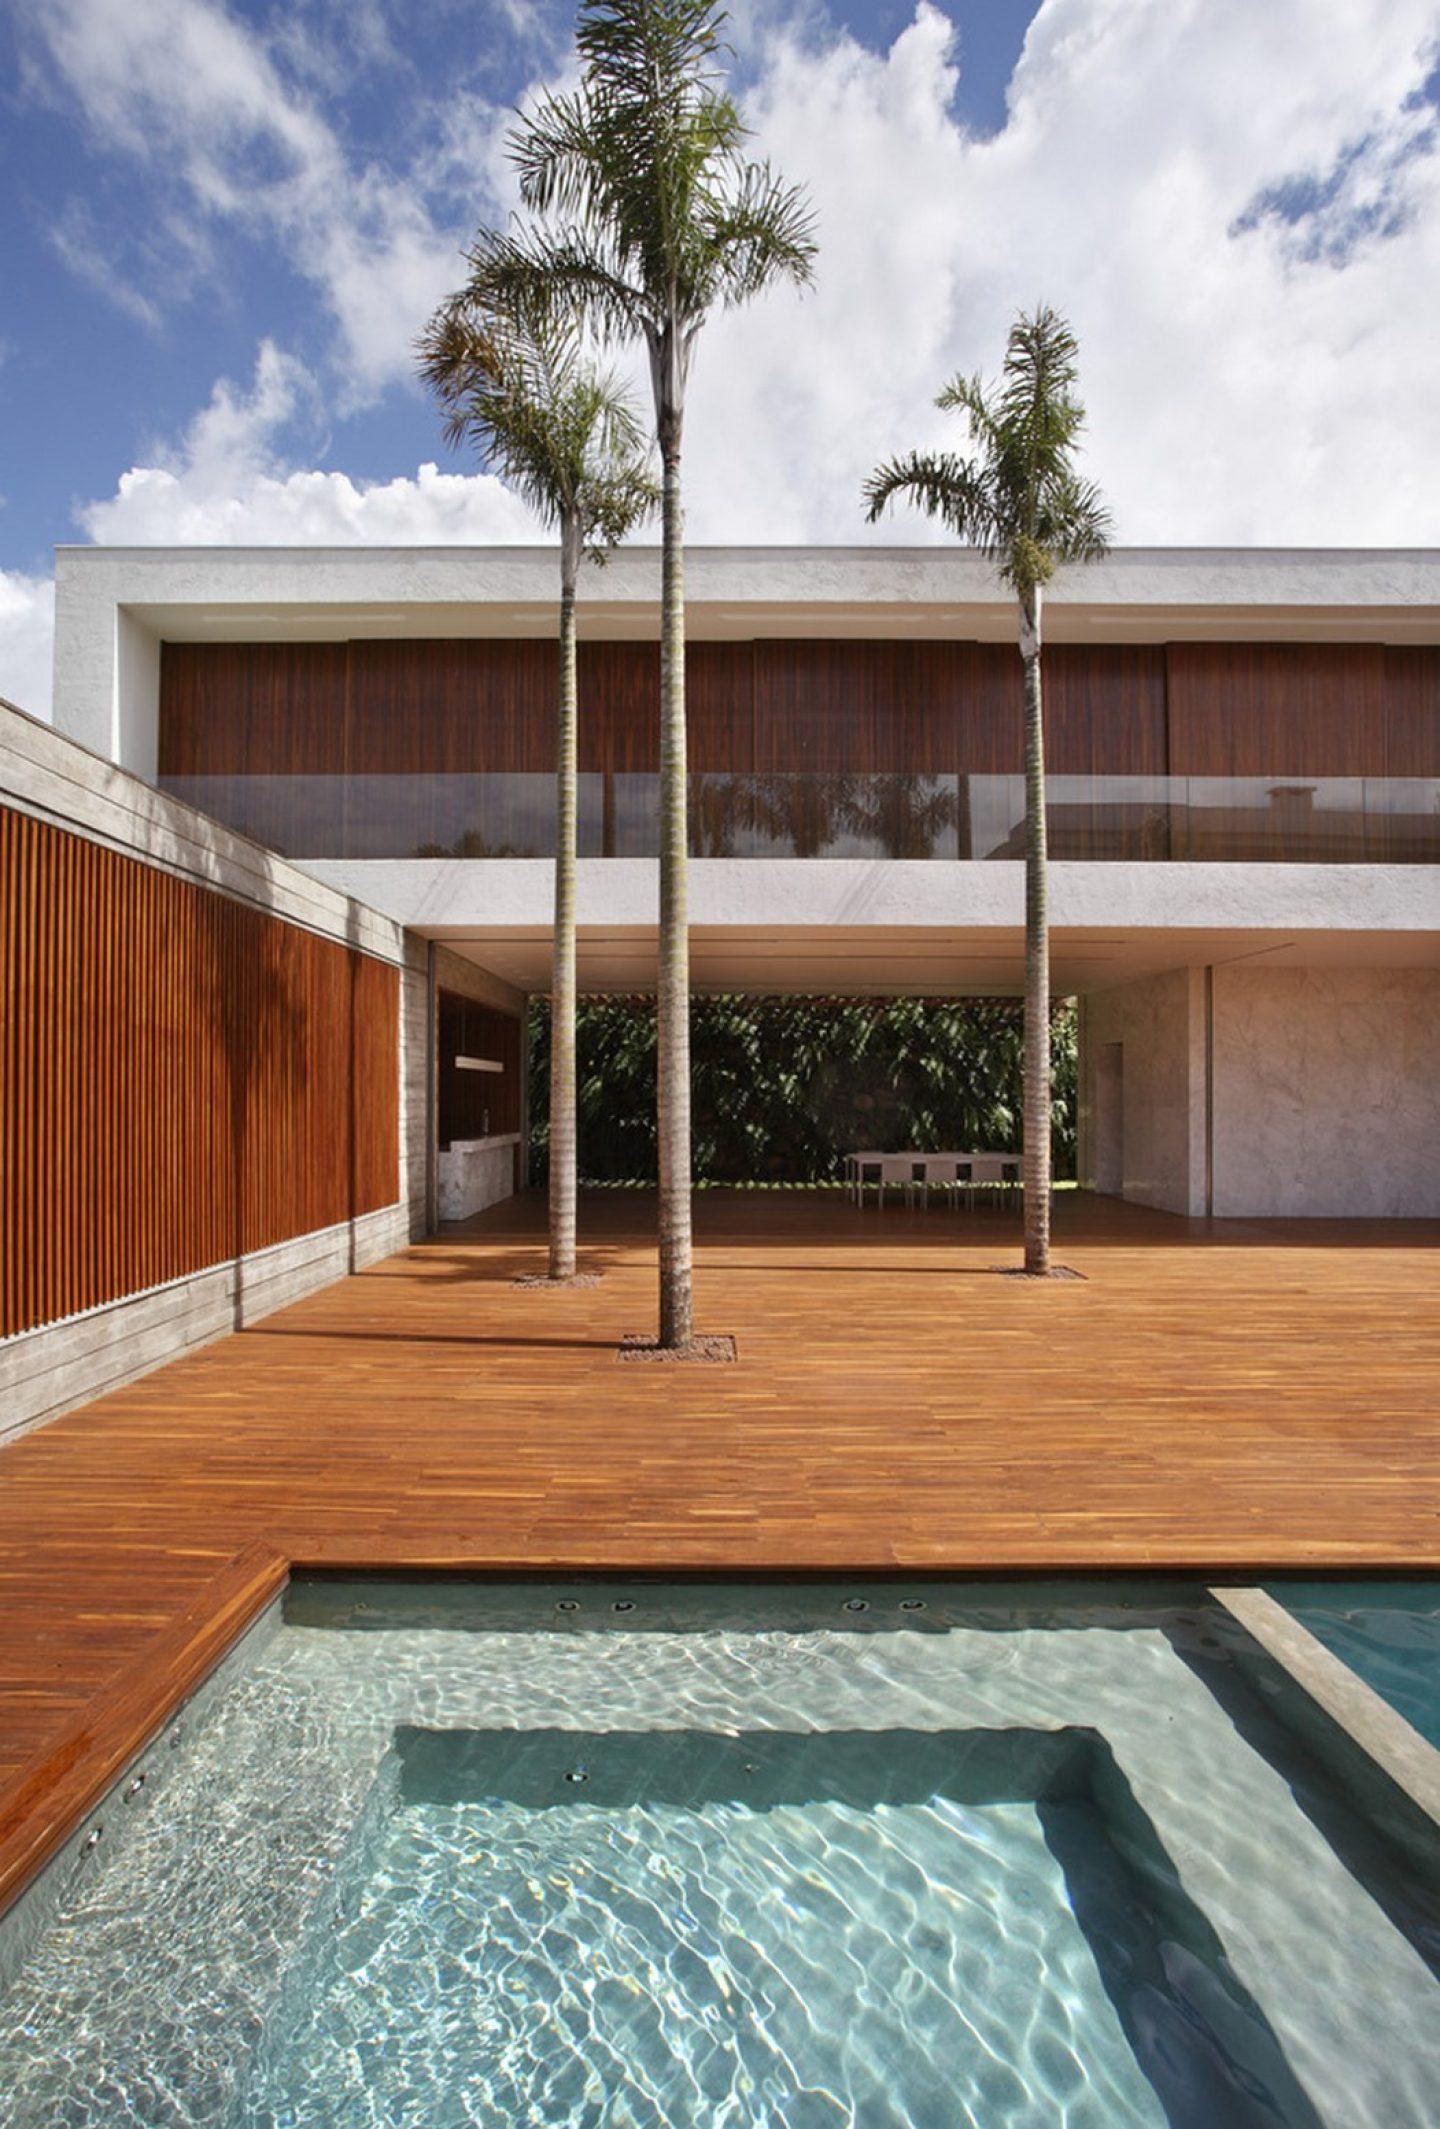 Guilherme_Torres_Architecture (18)